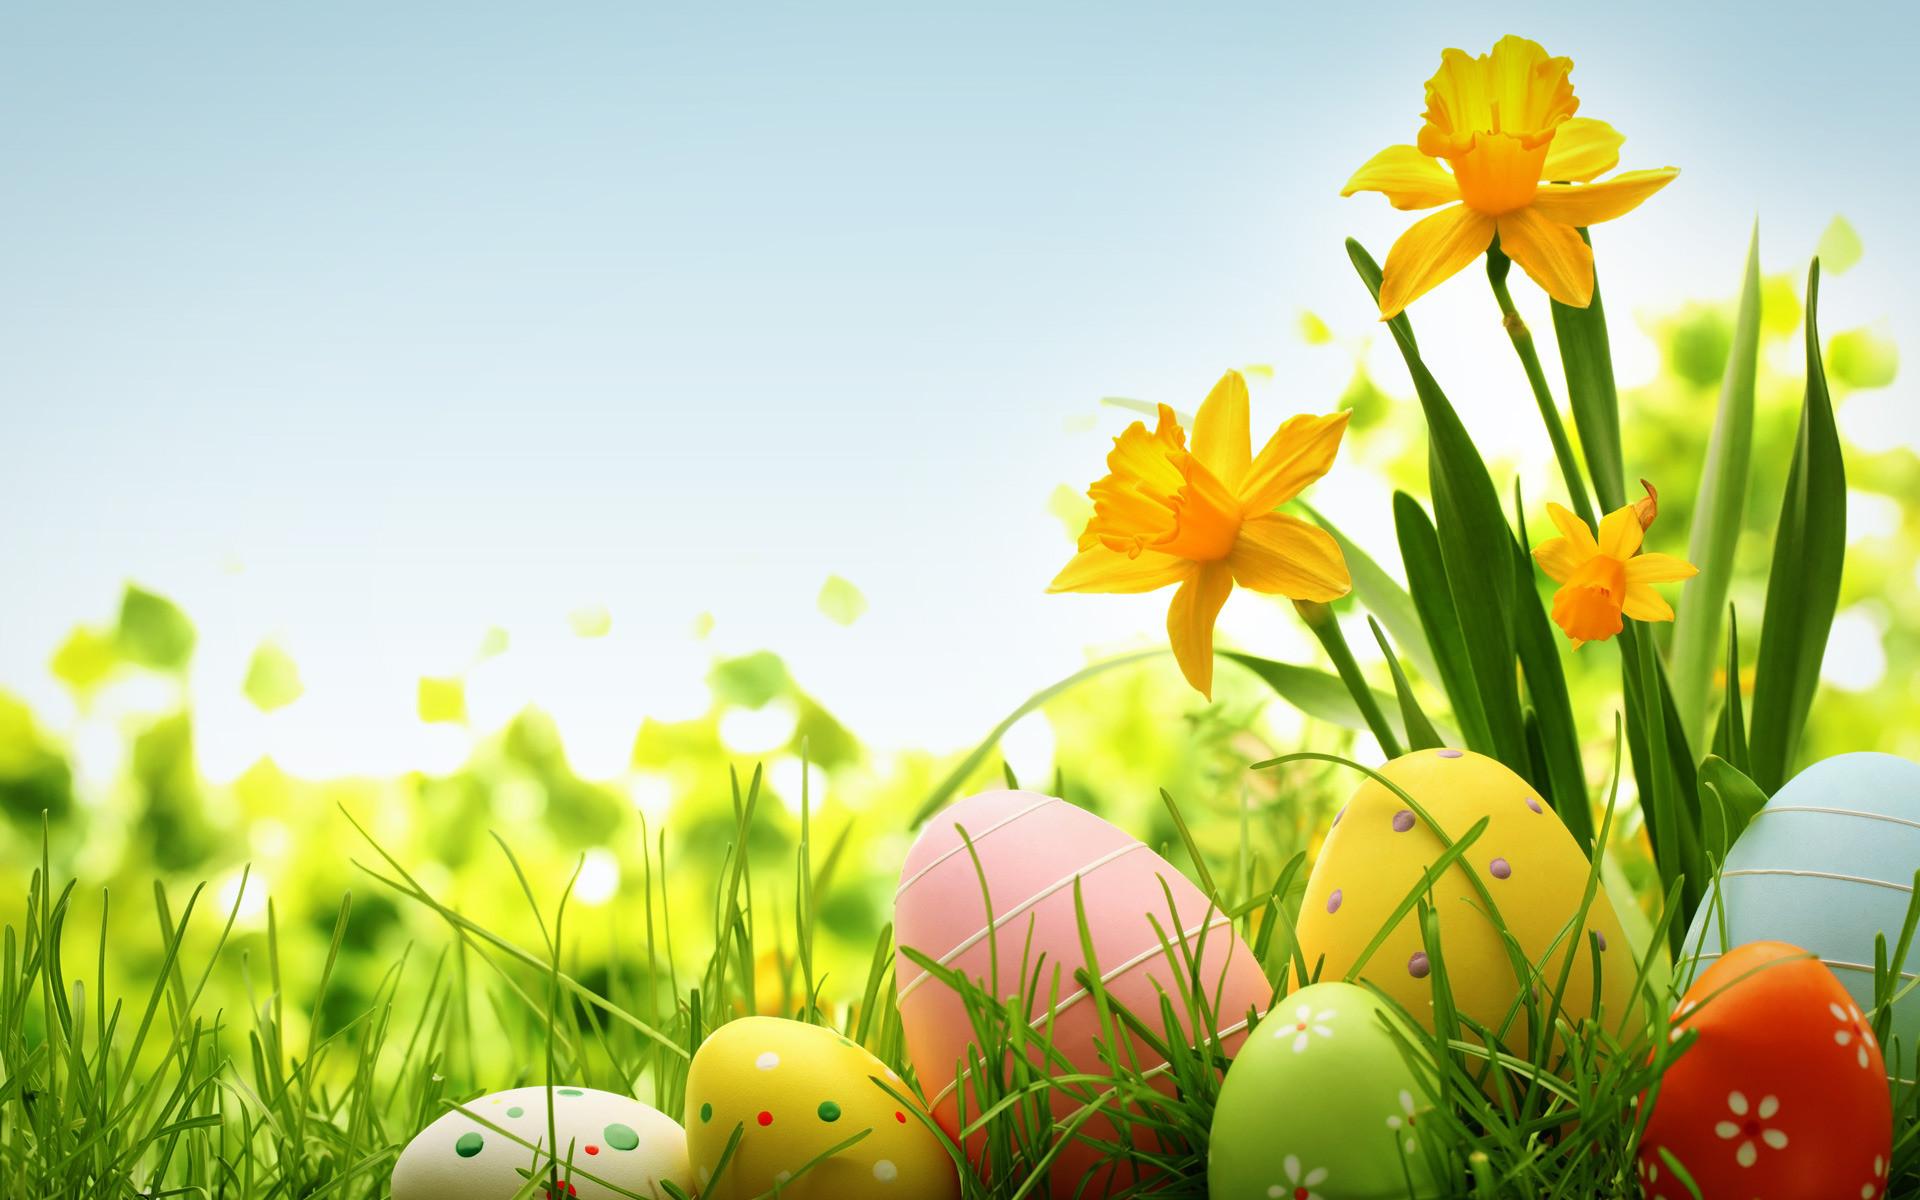 Easter Wallpaper HD. Easter desktop wallpaper